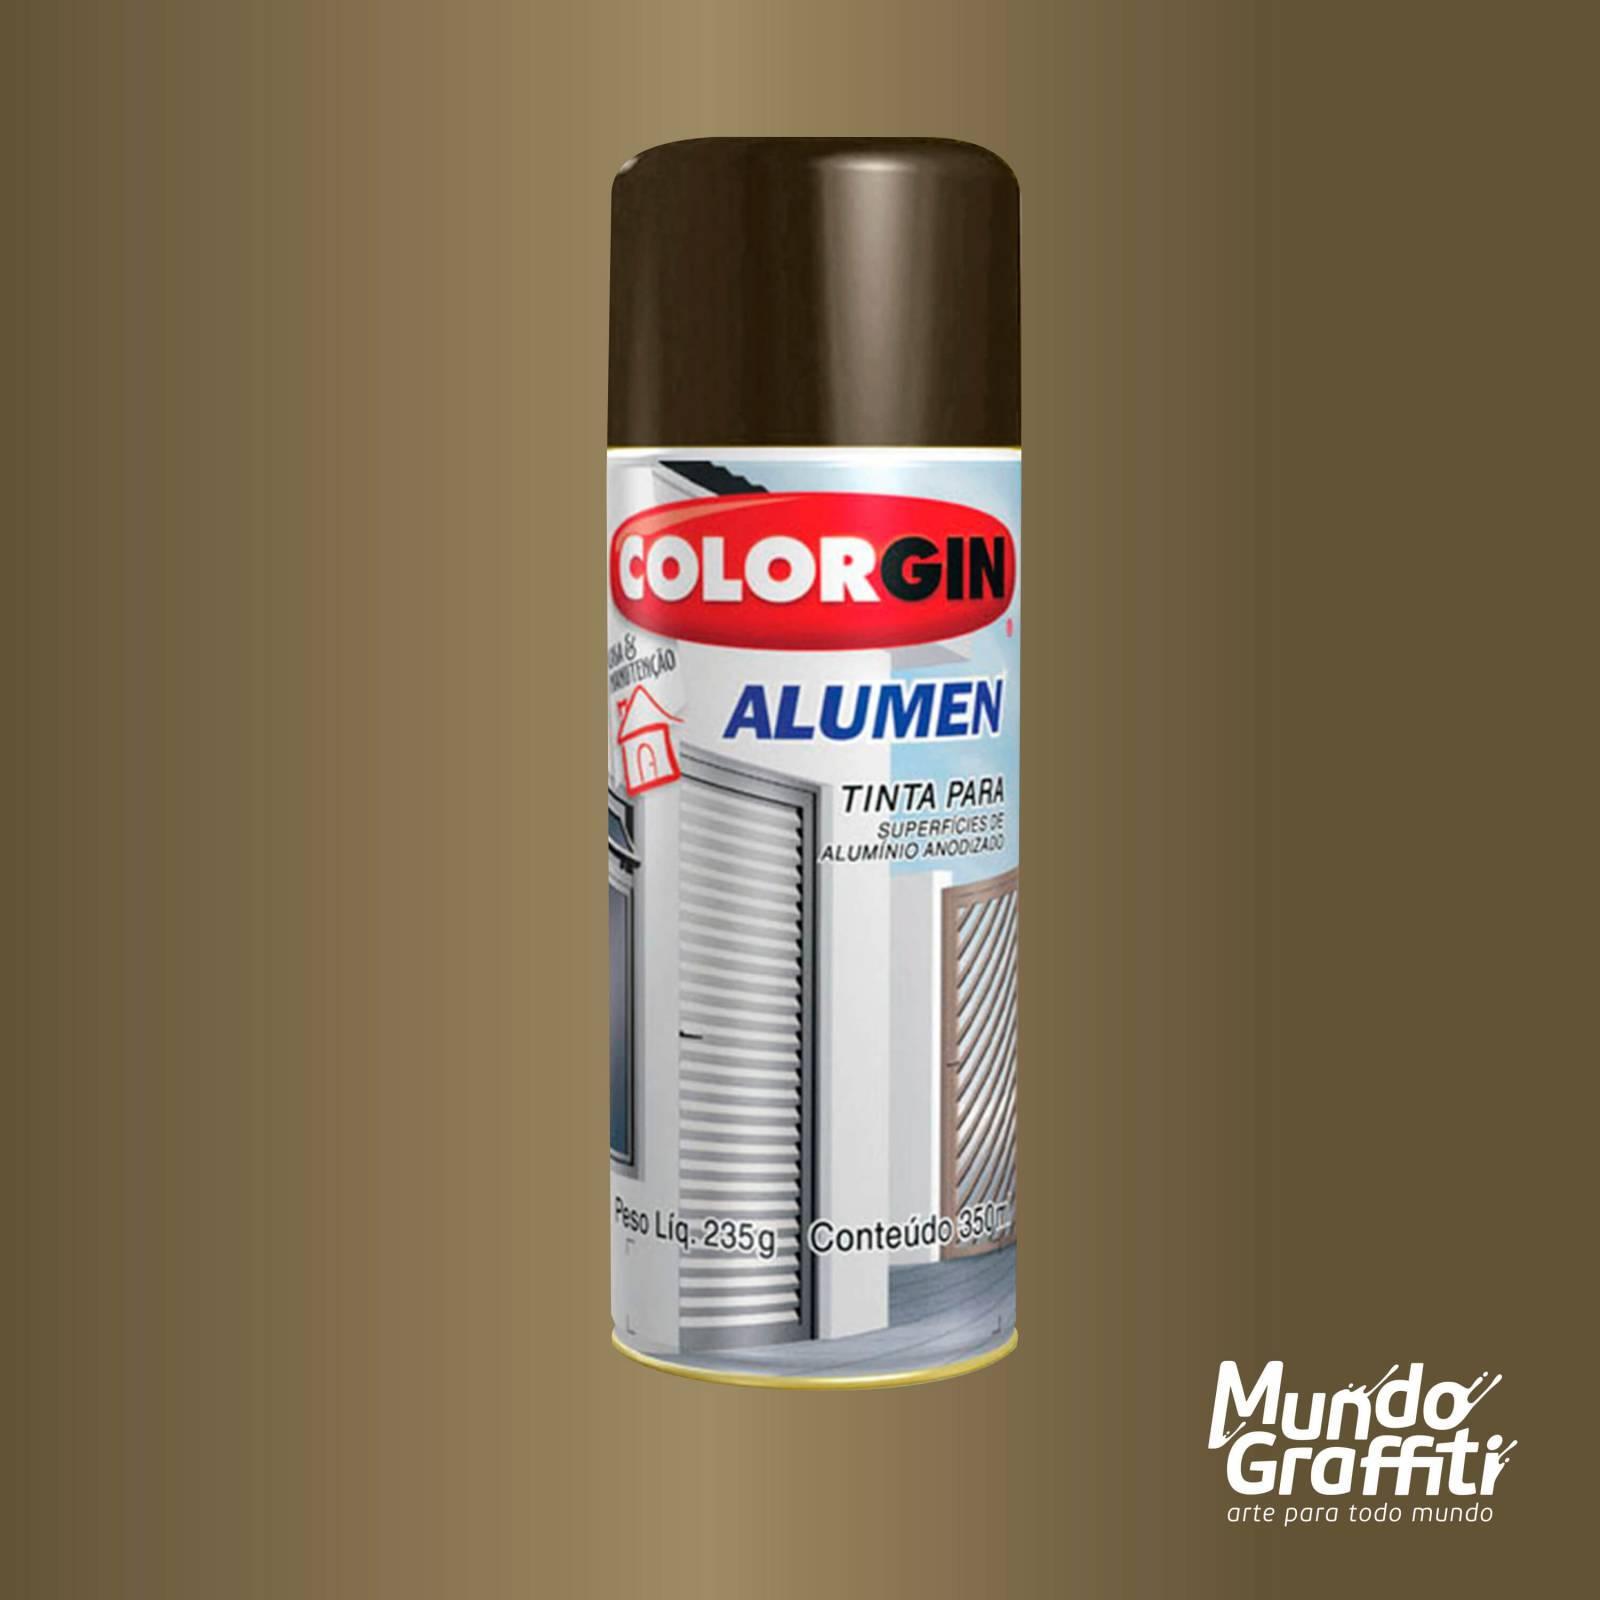 Tinta Spray Colorgin Alumen Bronze 1002 350ml - Mundo Graffiti